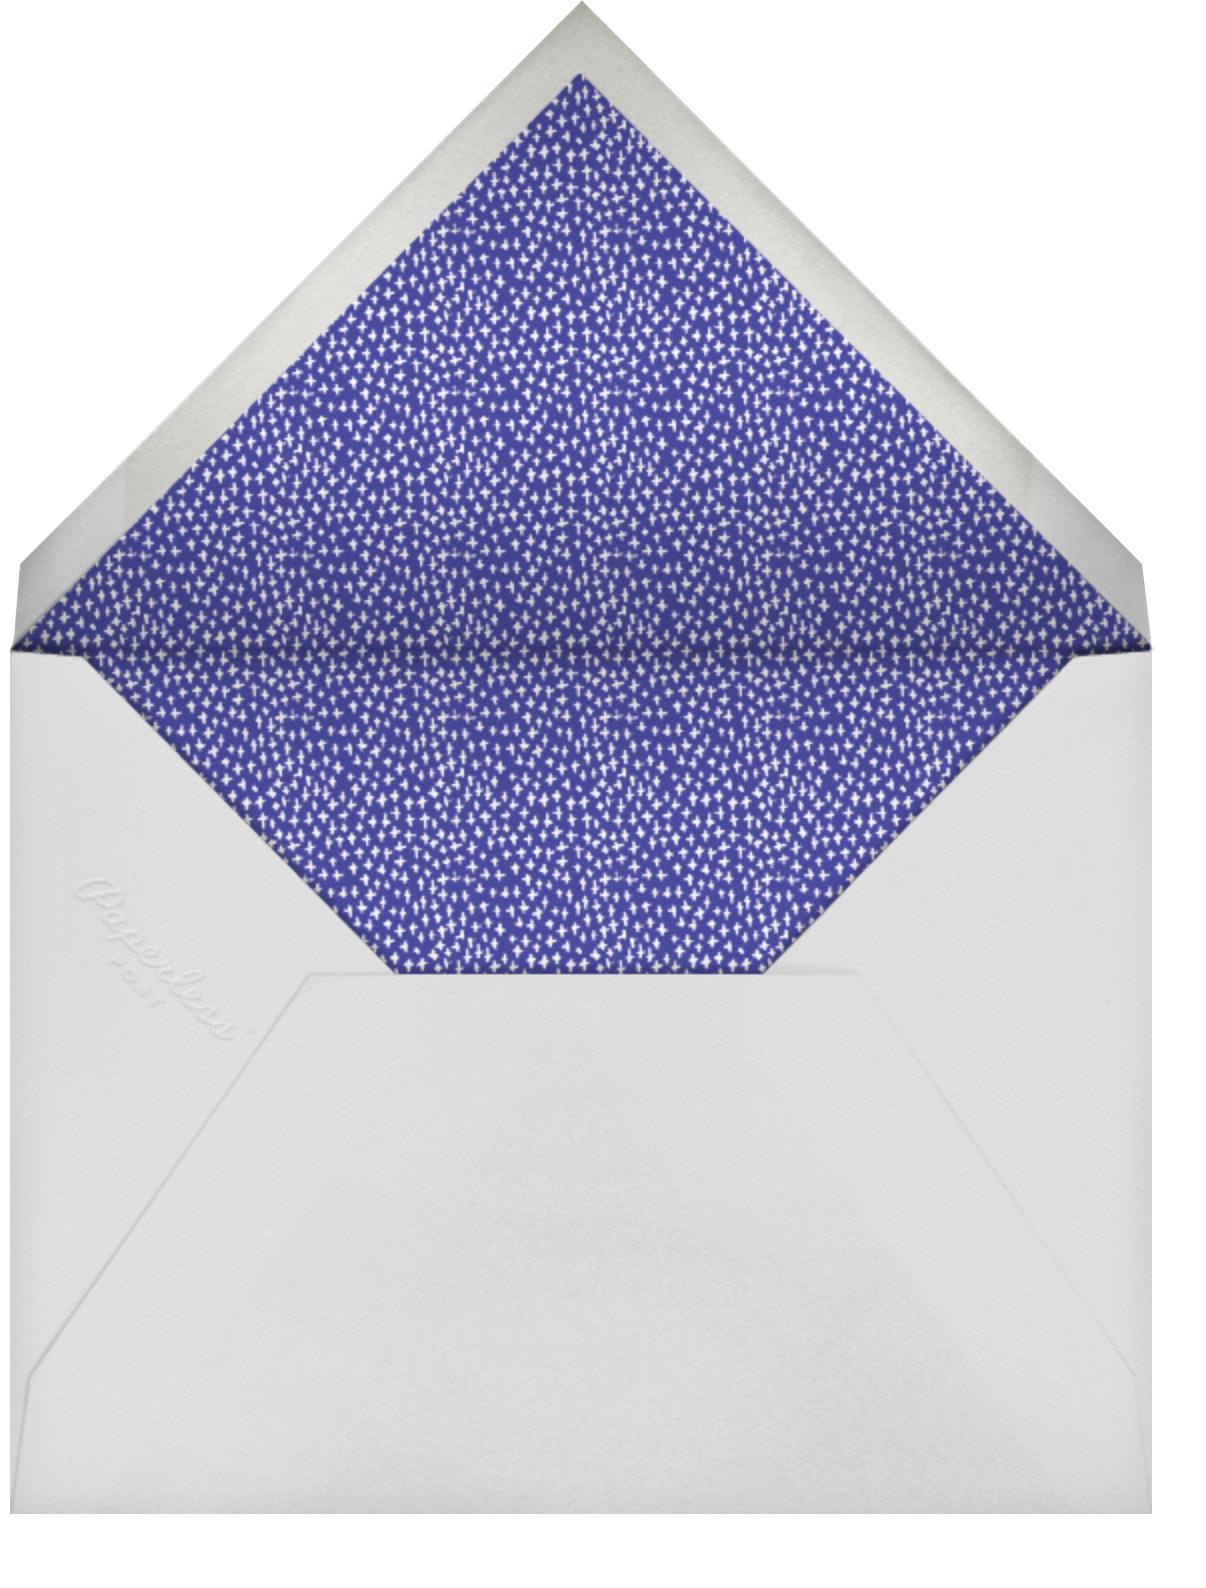 Penciled Garden - Mr. Boddington's Studio - Save the date - envelope back